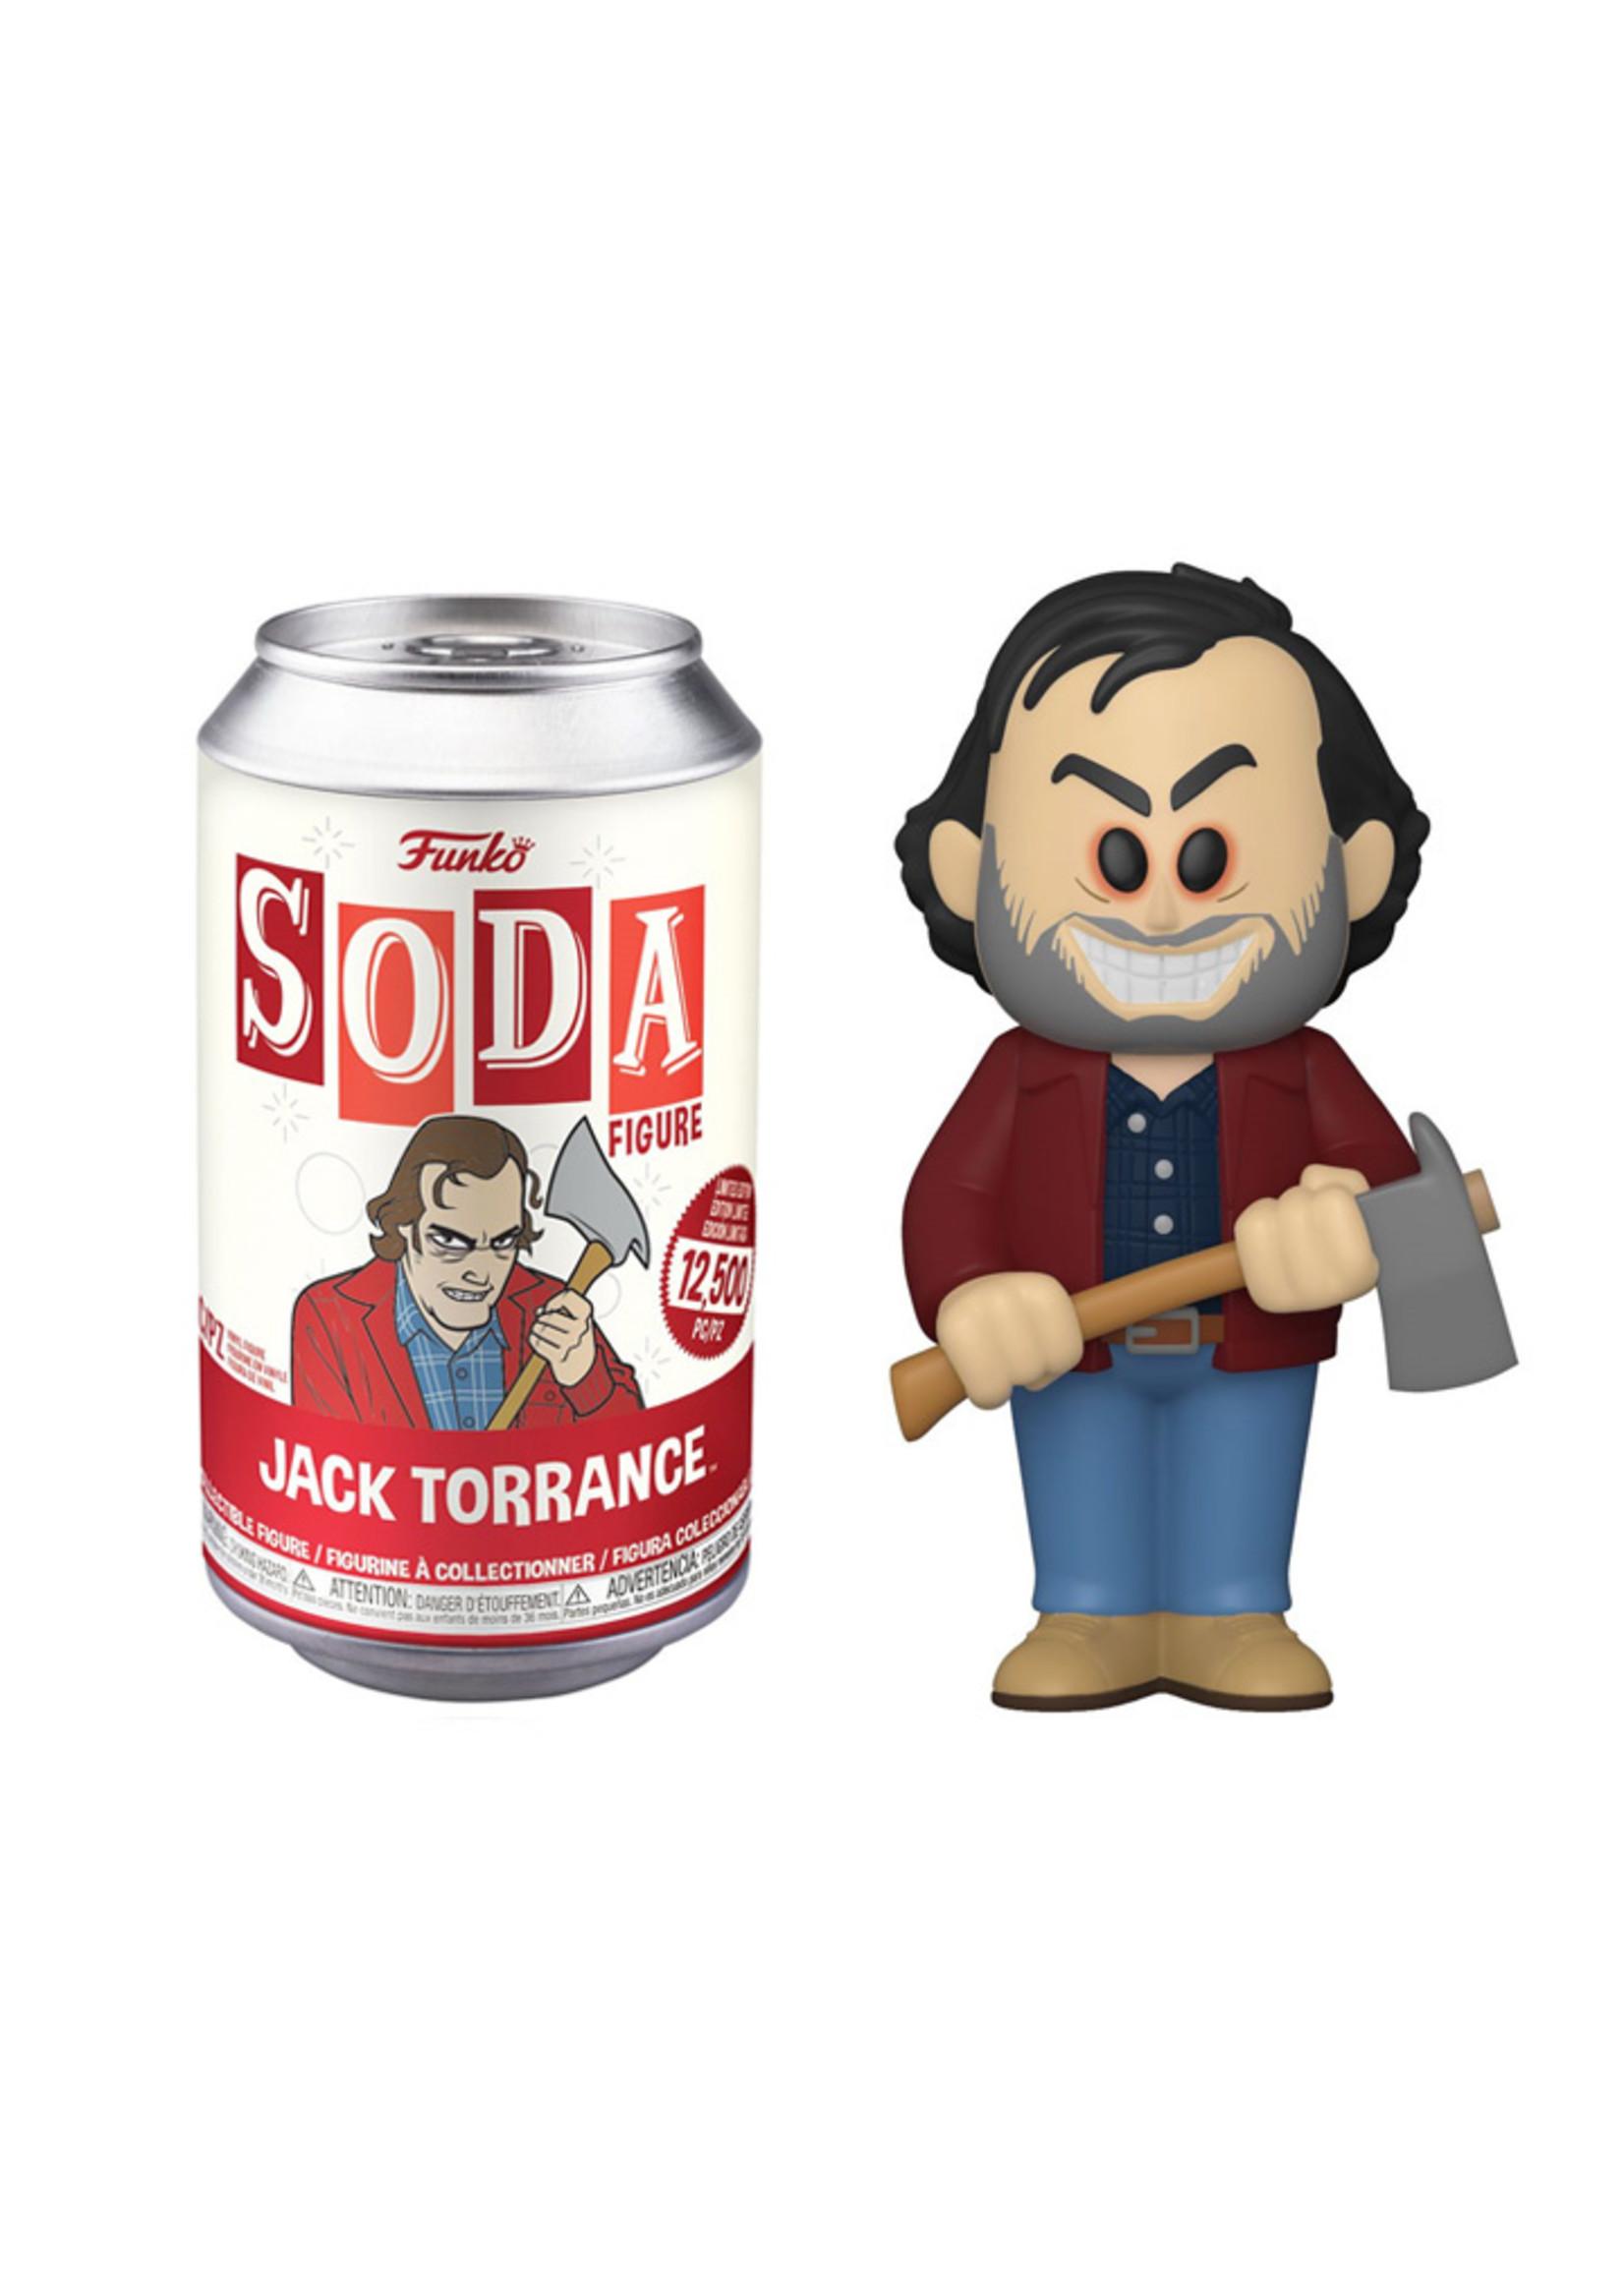 Vinyl Soda The Shining Jack Torrance Chance for Chase